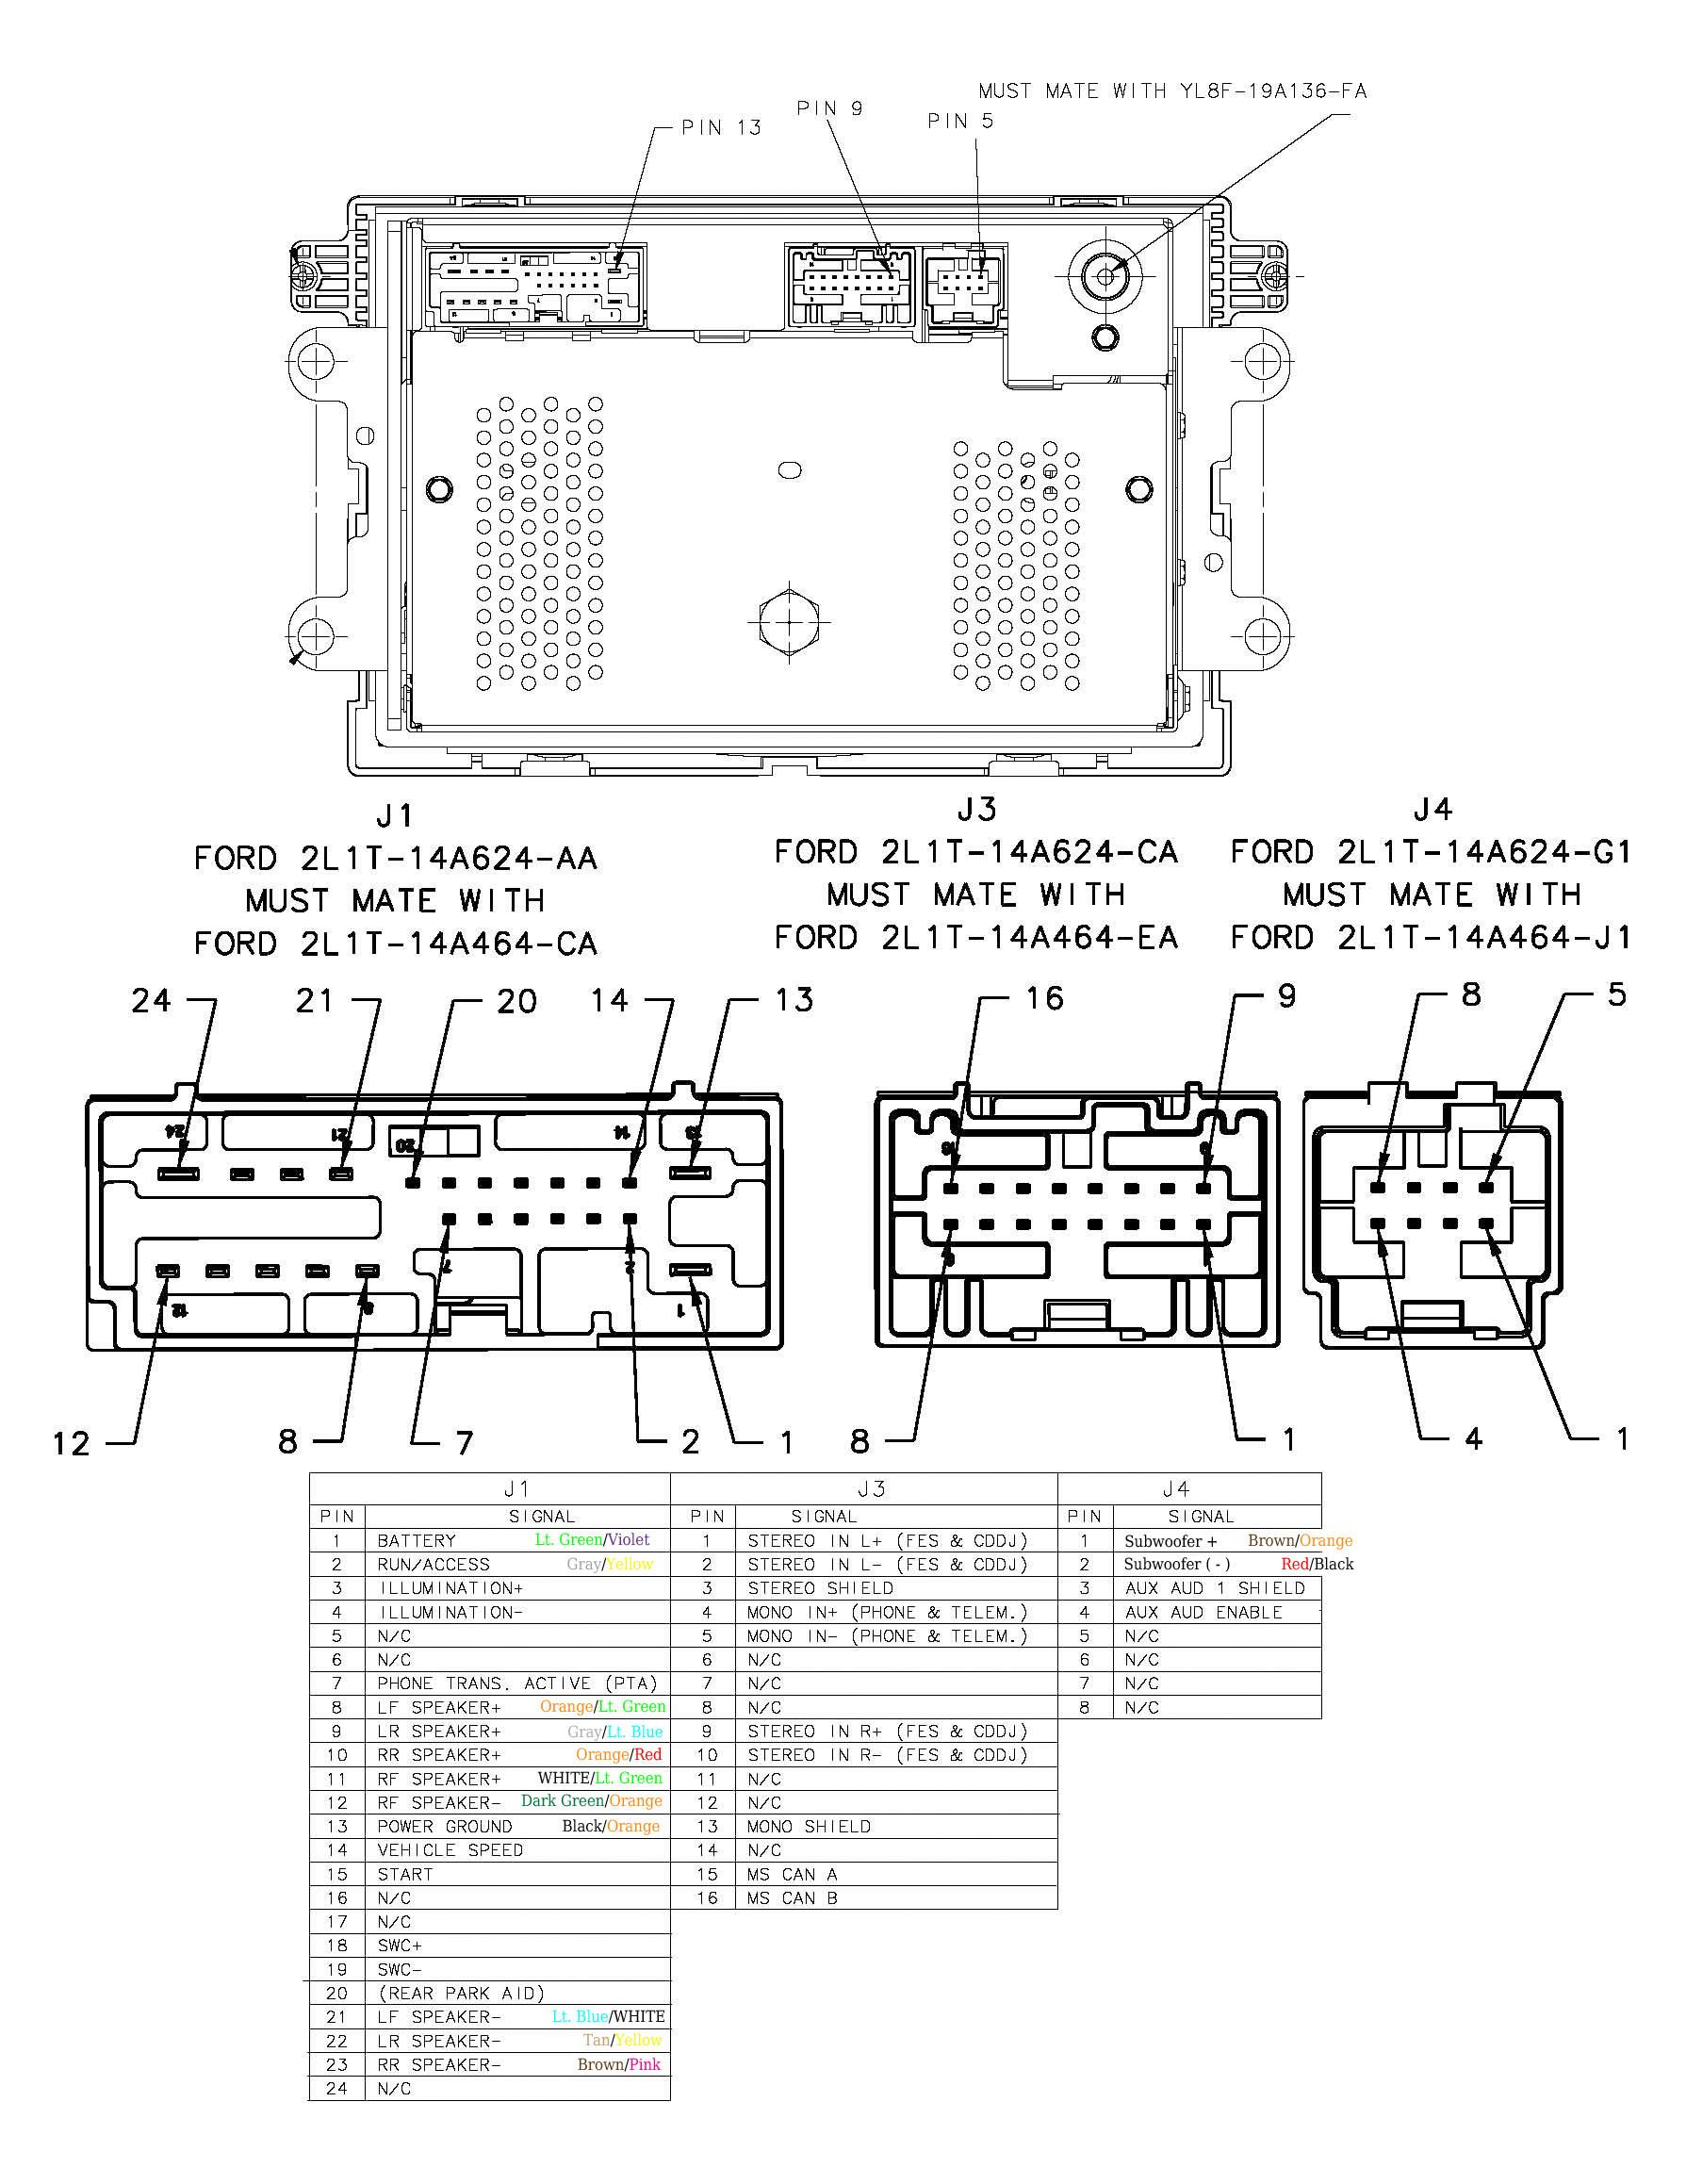 Ford Mustang Radio Wiring Diagram - Mikulskilawoffices - Ford Radio Wiring Diagram